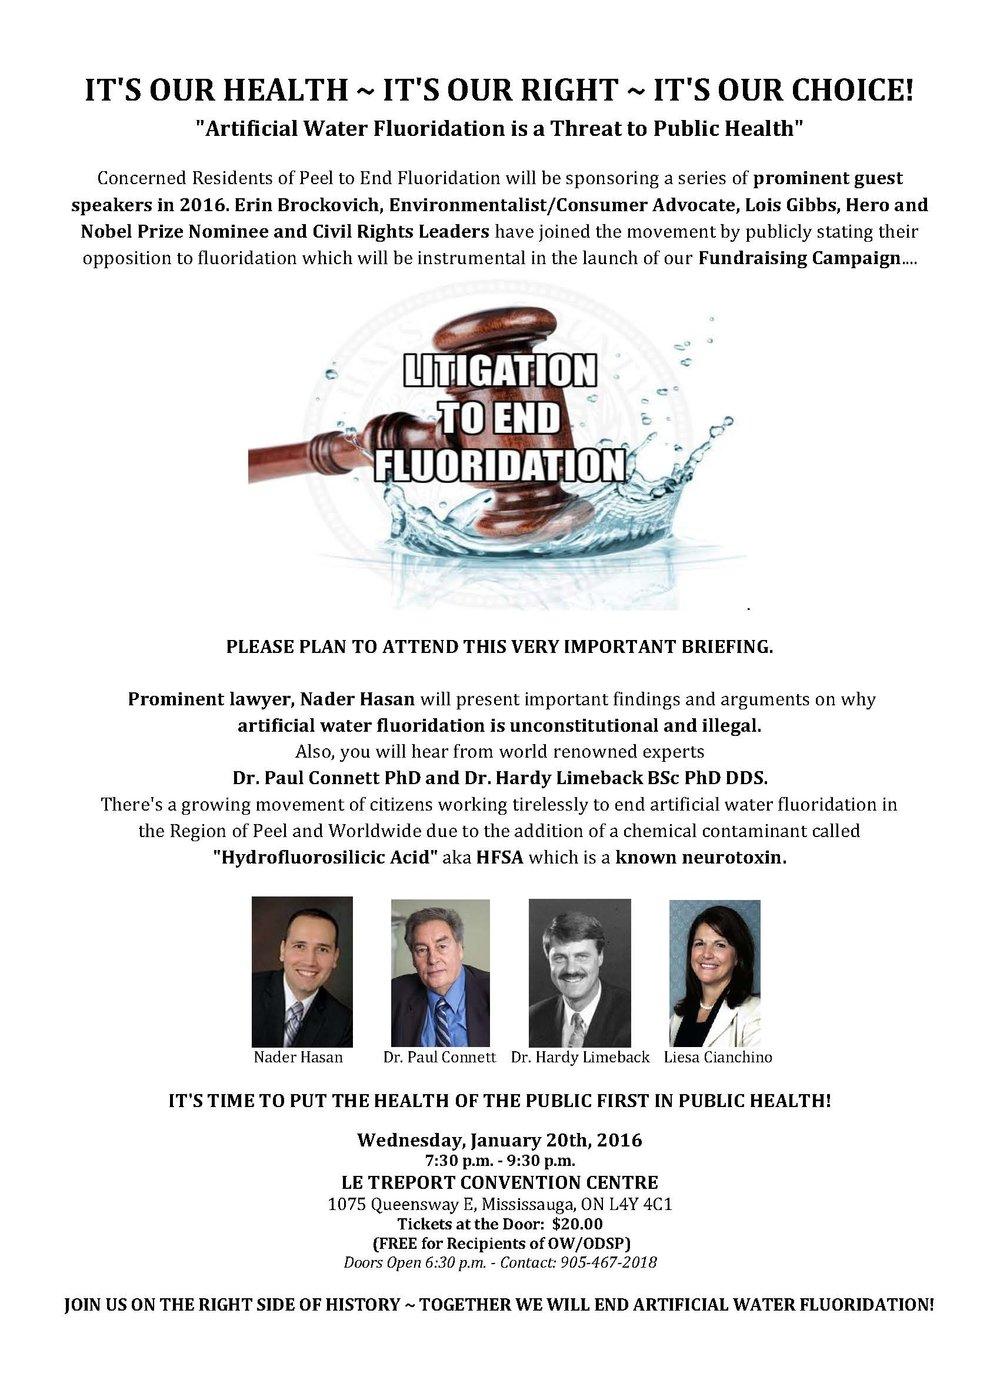 Litigation to End Fluoridation - January 20, 2016